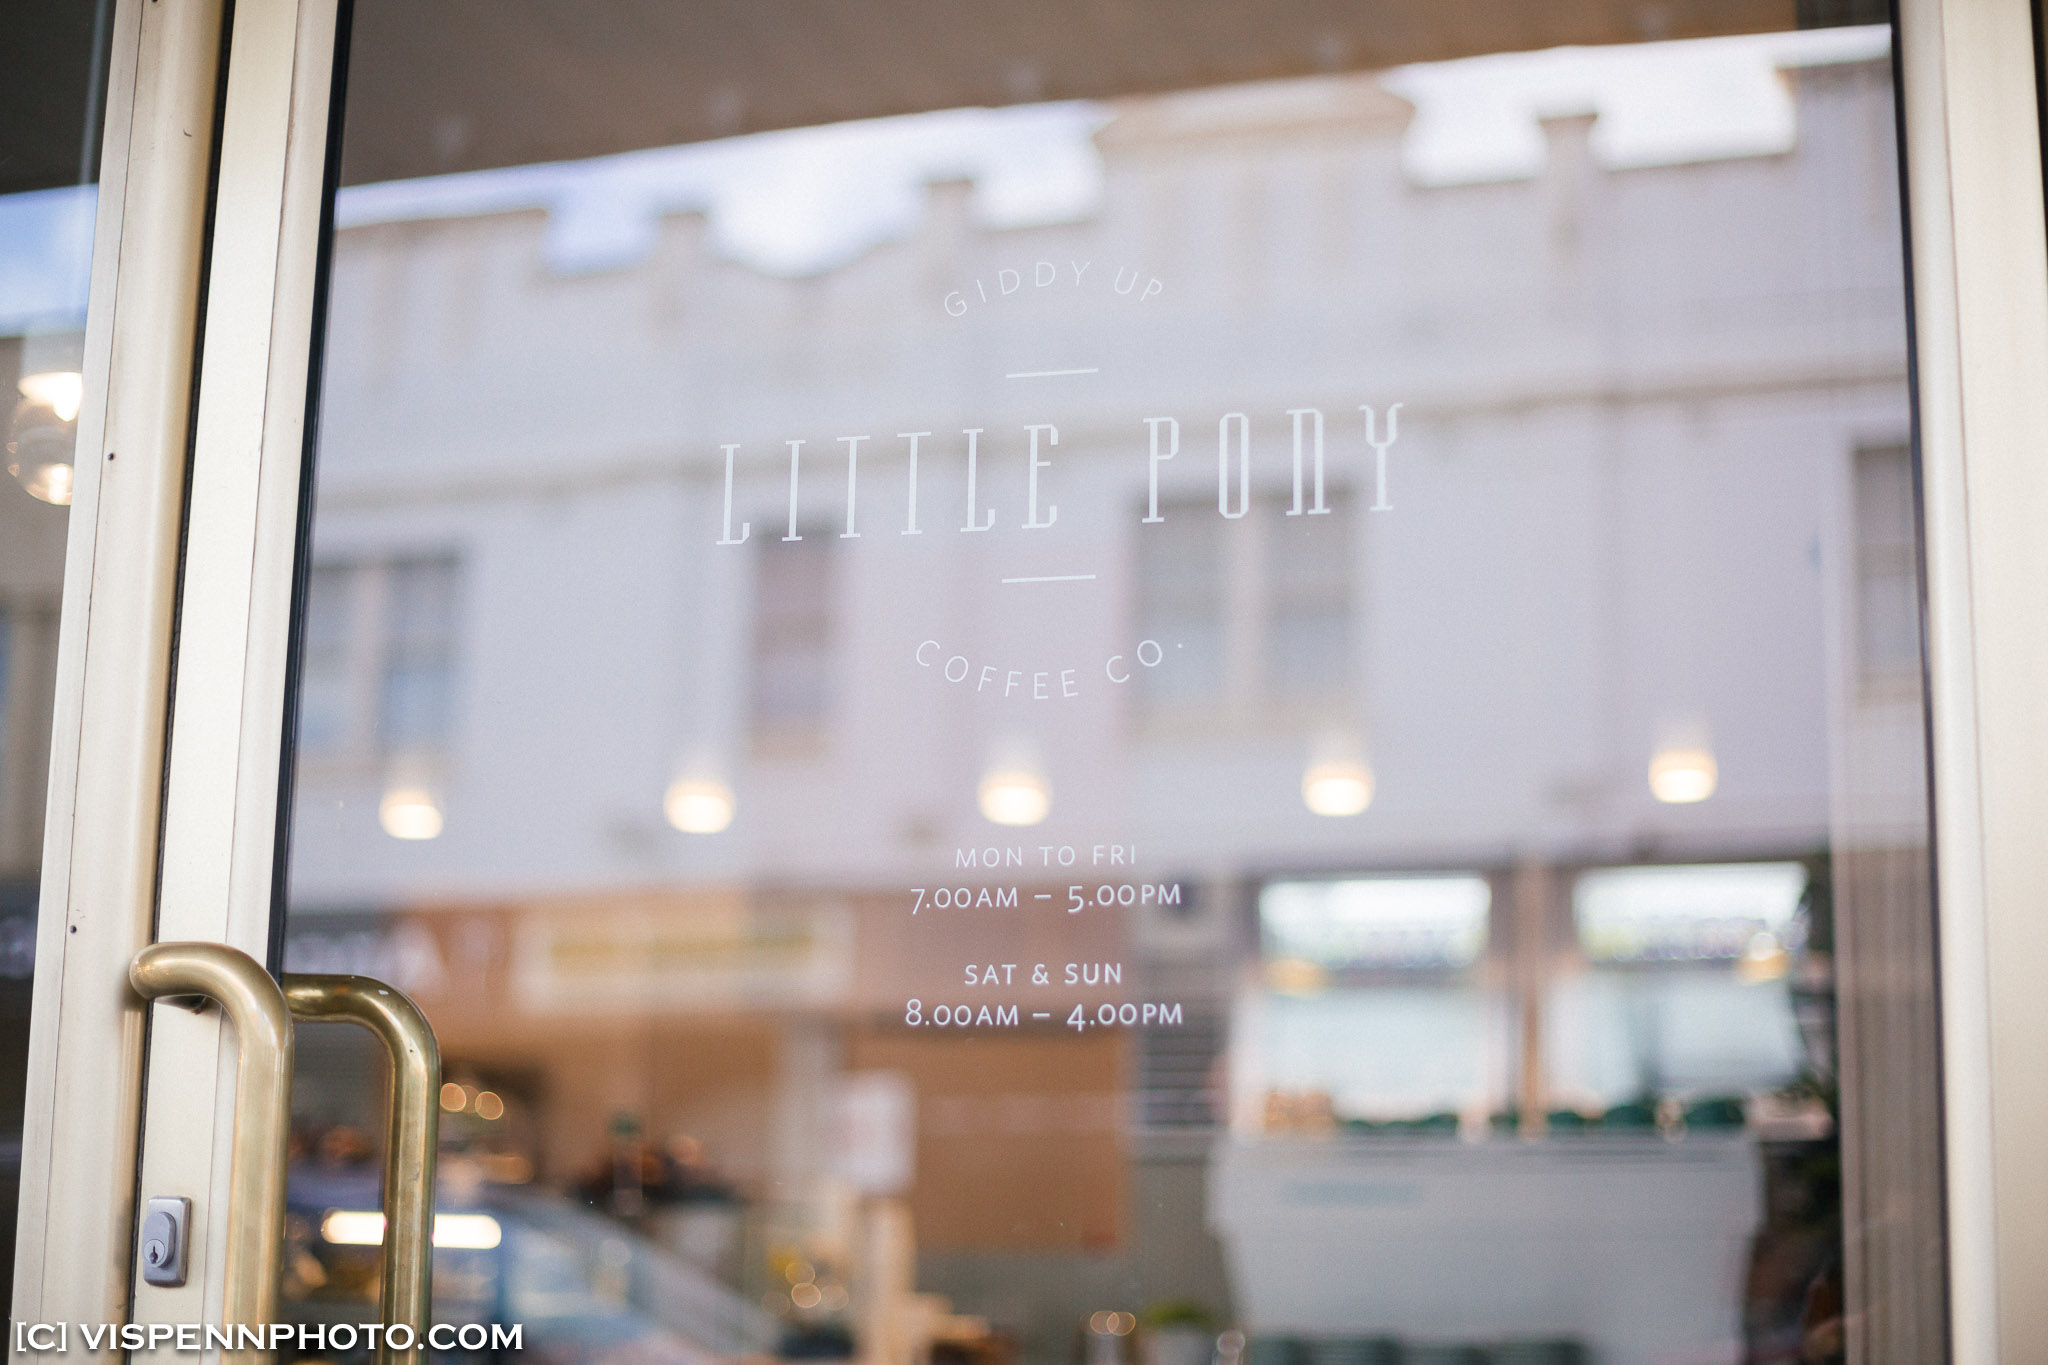 REAL ESTATE INTERIOR Photography Melbourne VISPENN 墨尔本 地产摄影 公寓拍摄 豪宅拍摄 VR远程看房 房产航拍 1R9A9037